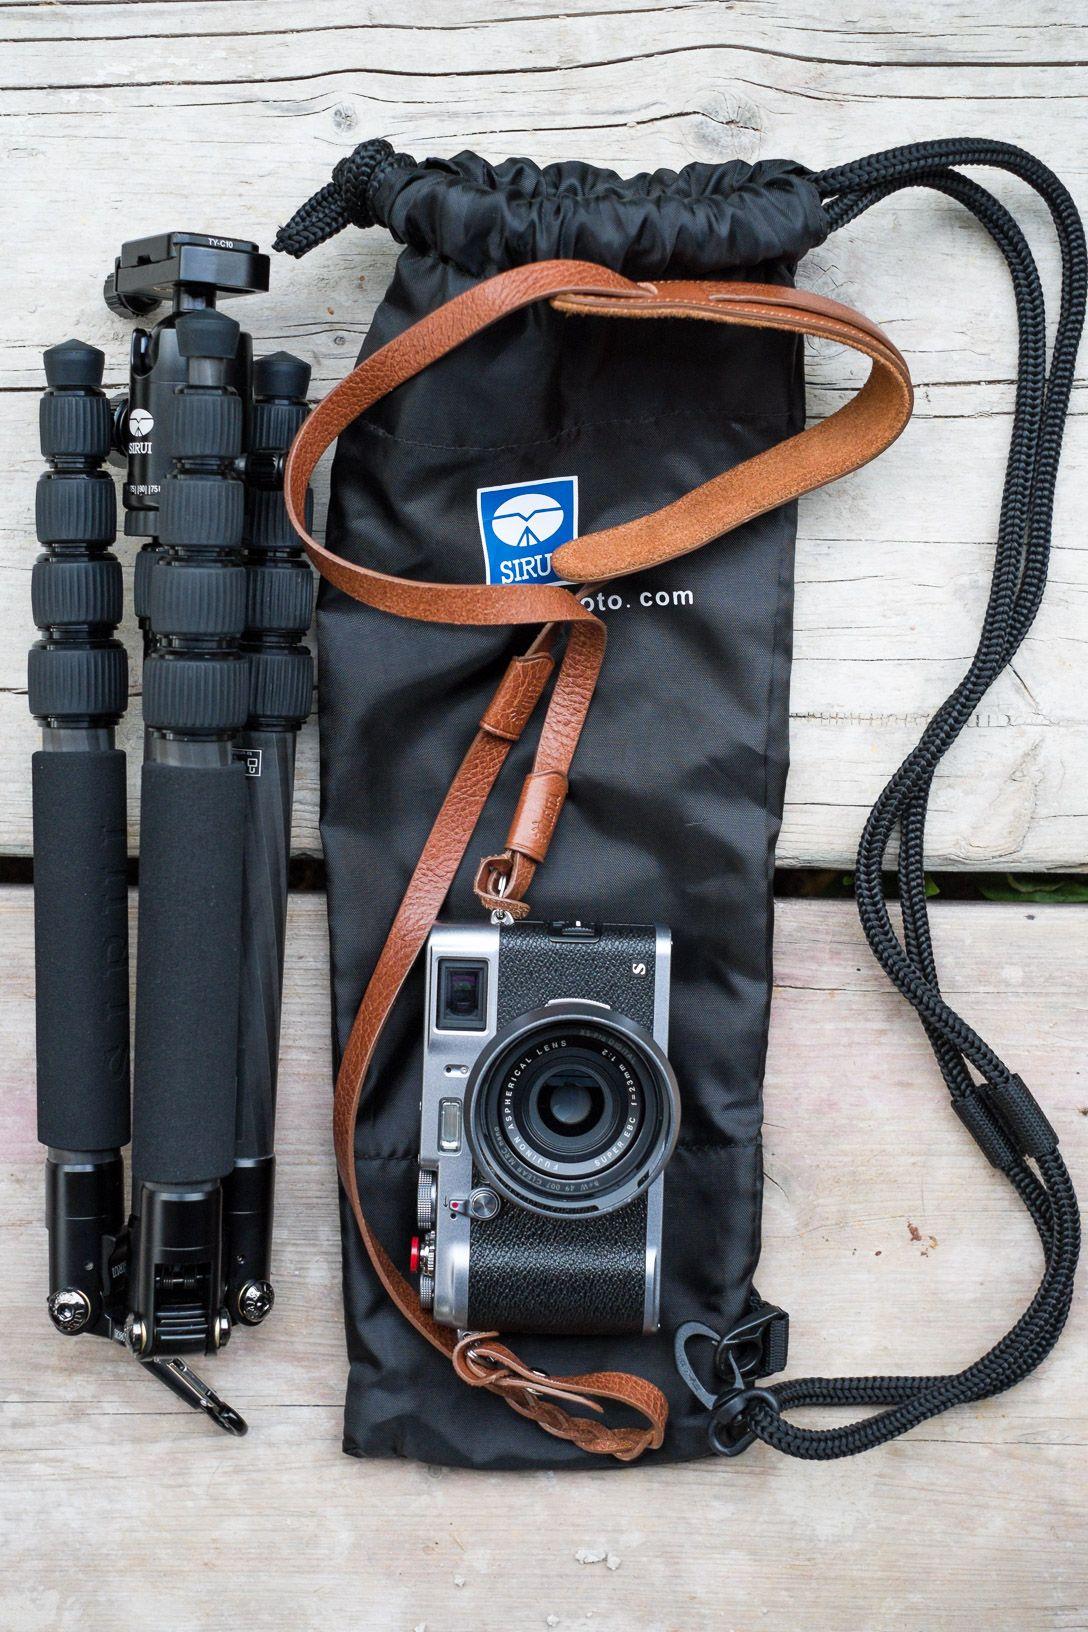 Sirui T 025x Carbon Mit Kugelkopf C10x Fur Das Fuji X System Kameras Kamera Herren Mode